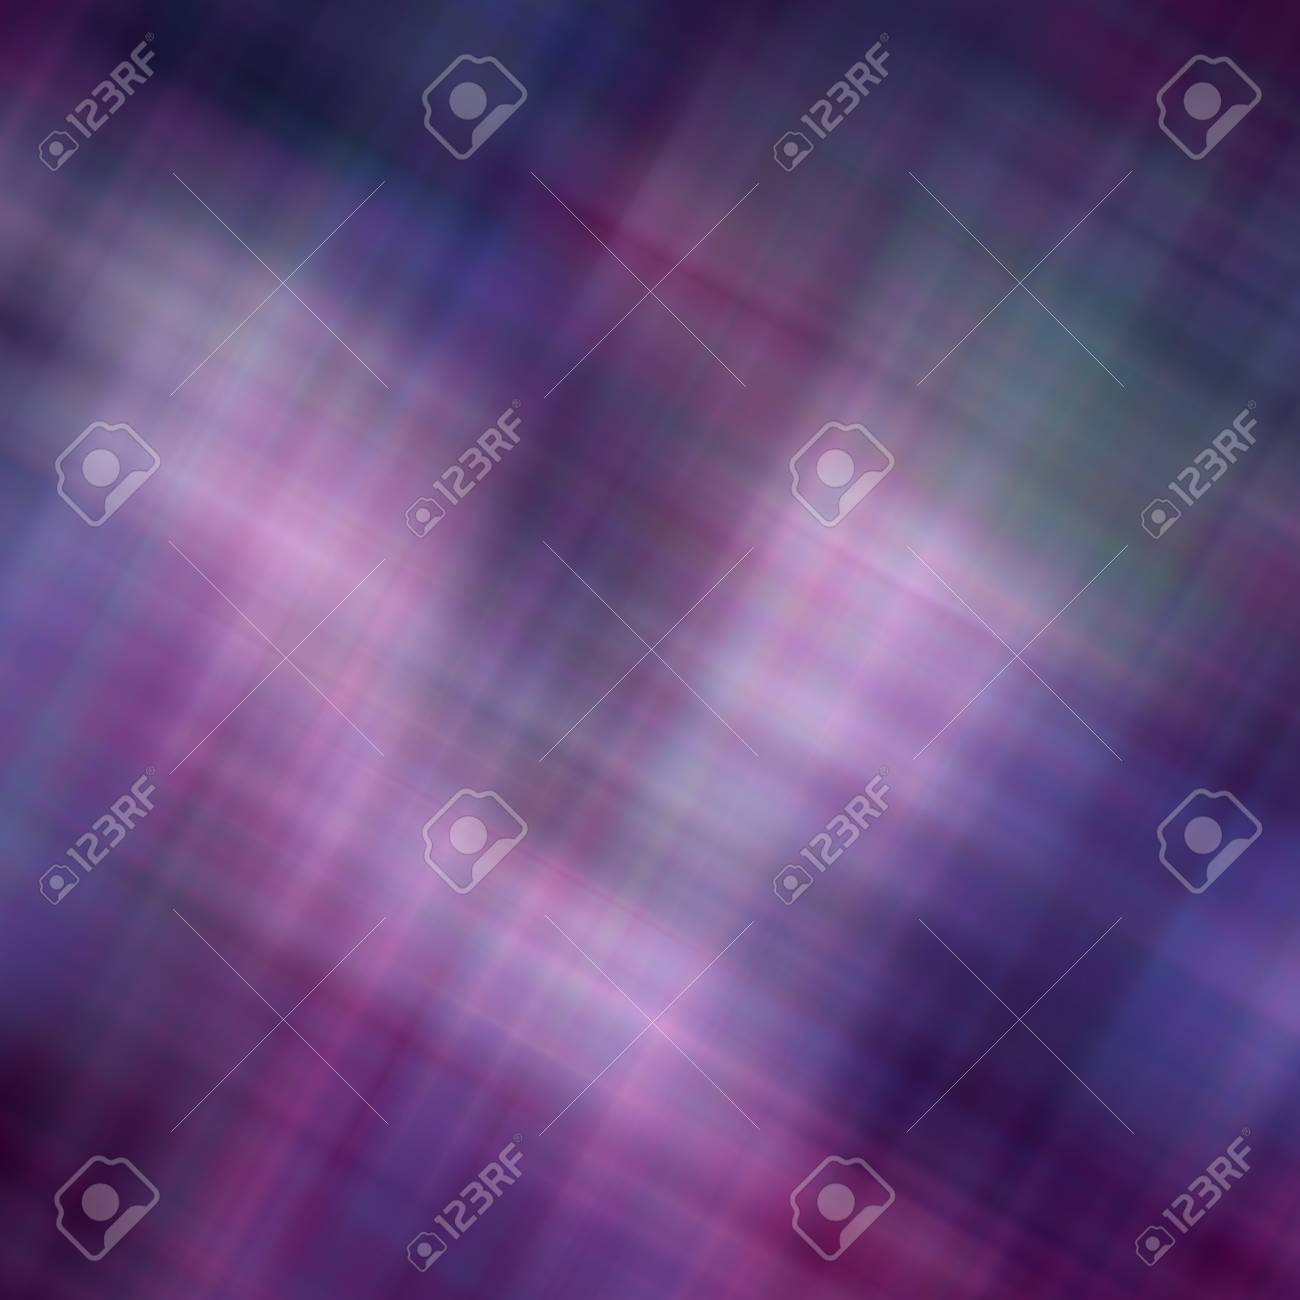 abstract light background. Raster illustration Stock Photo - 17606293